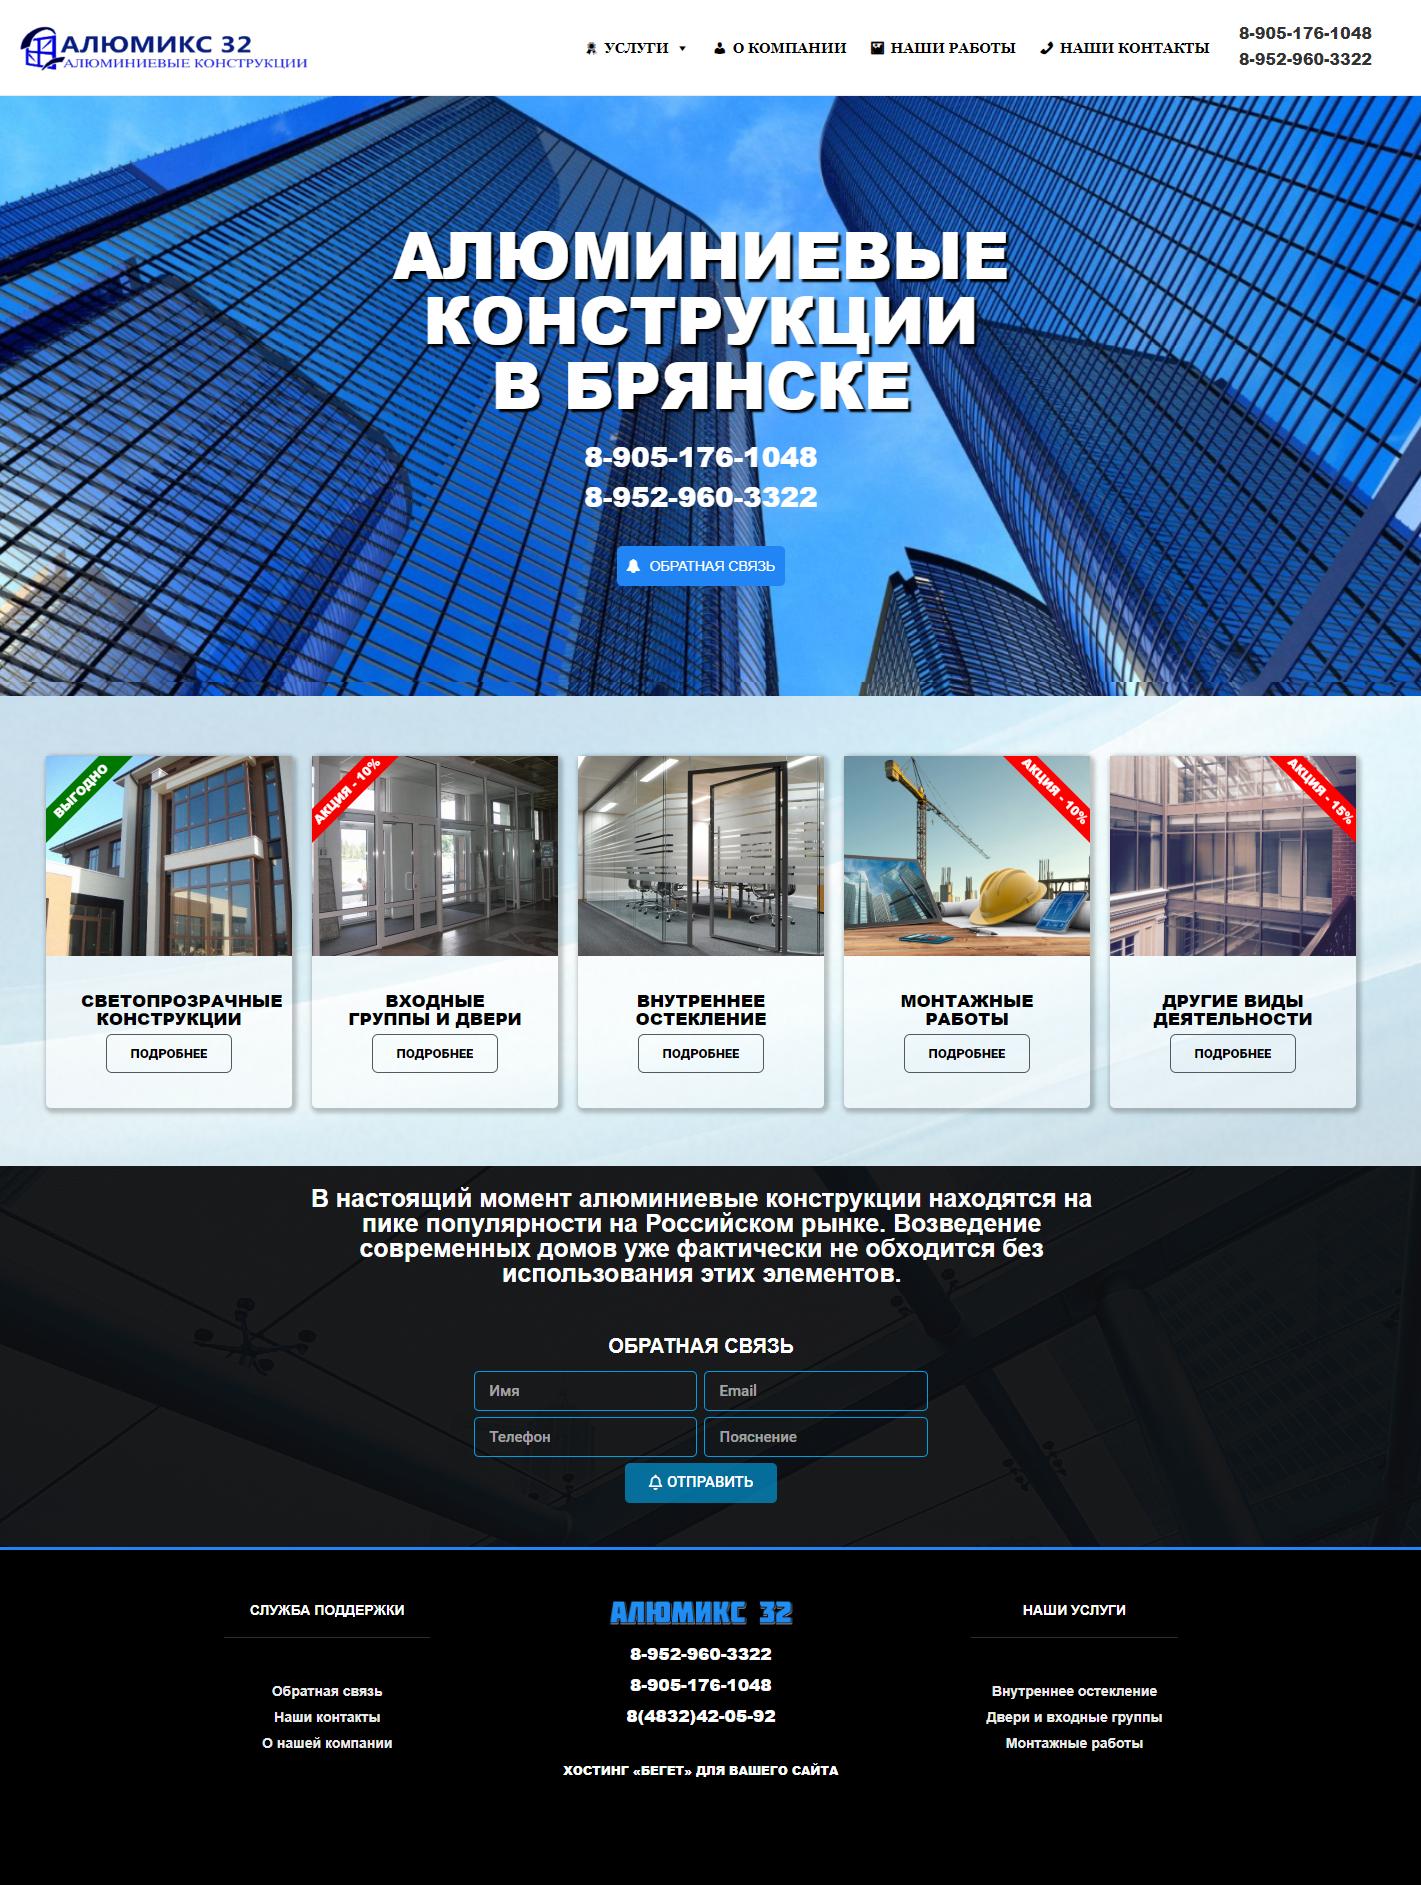 Создание корпоративного сайта в Брянске